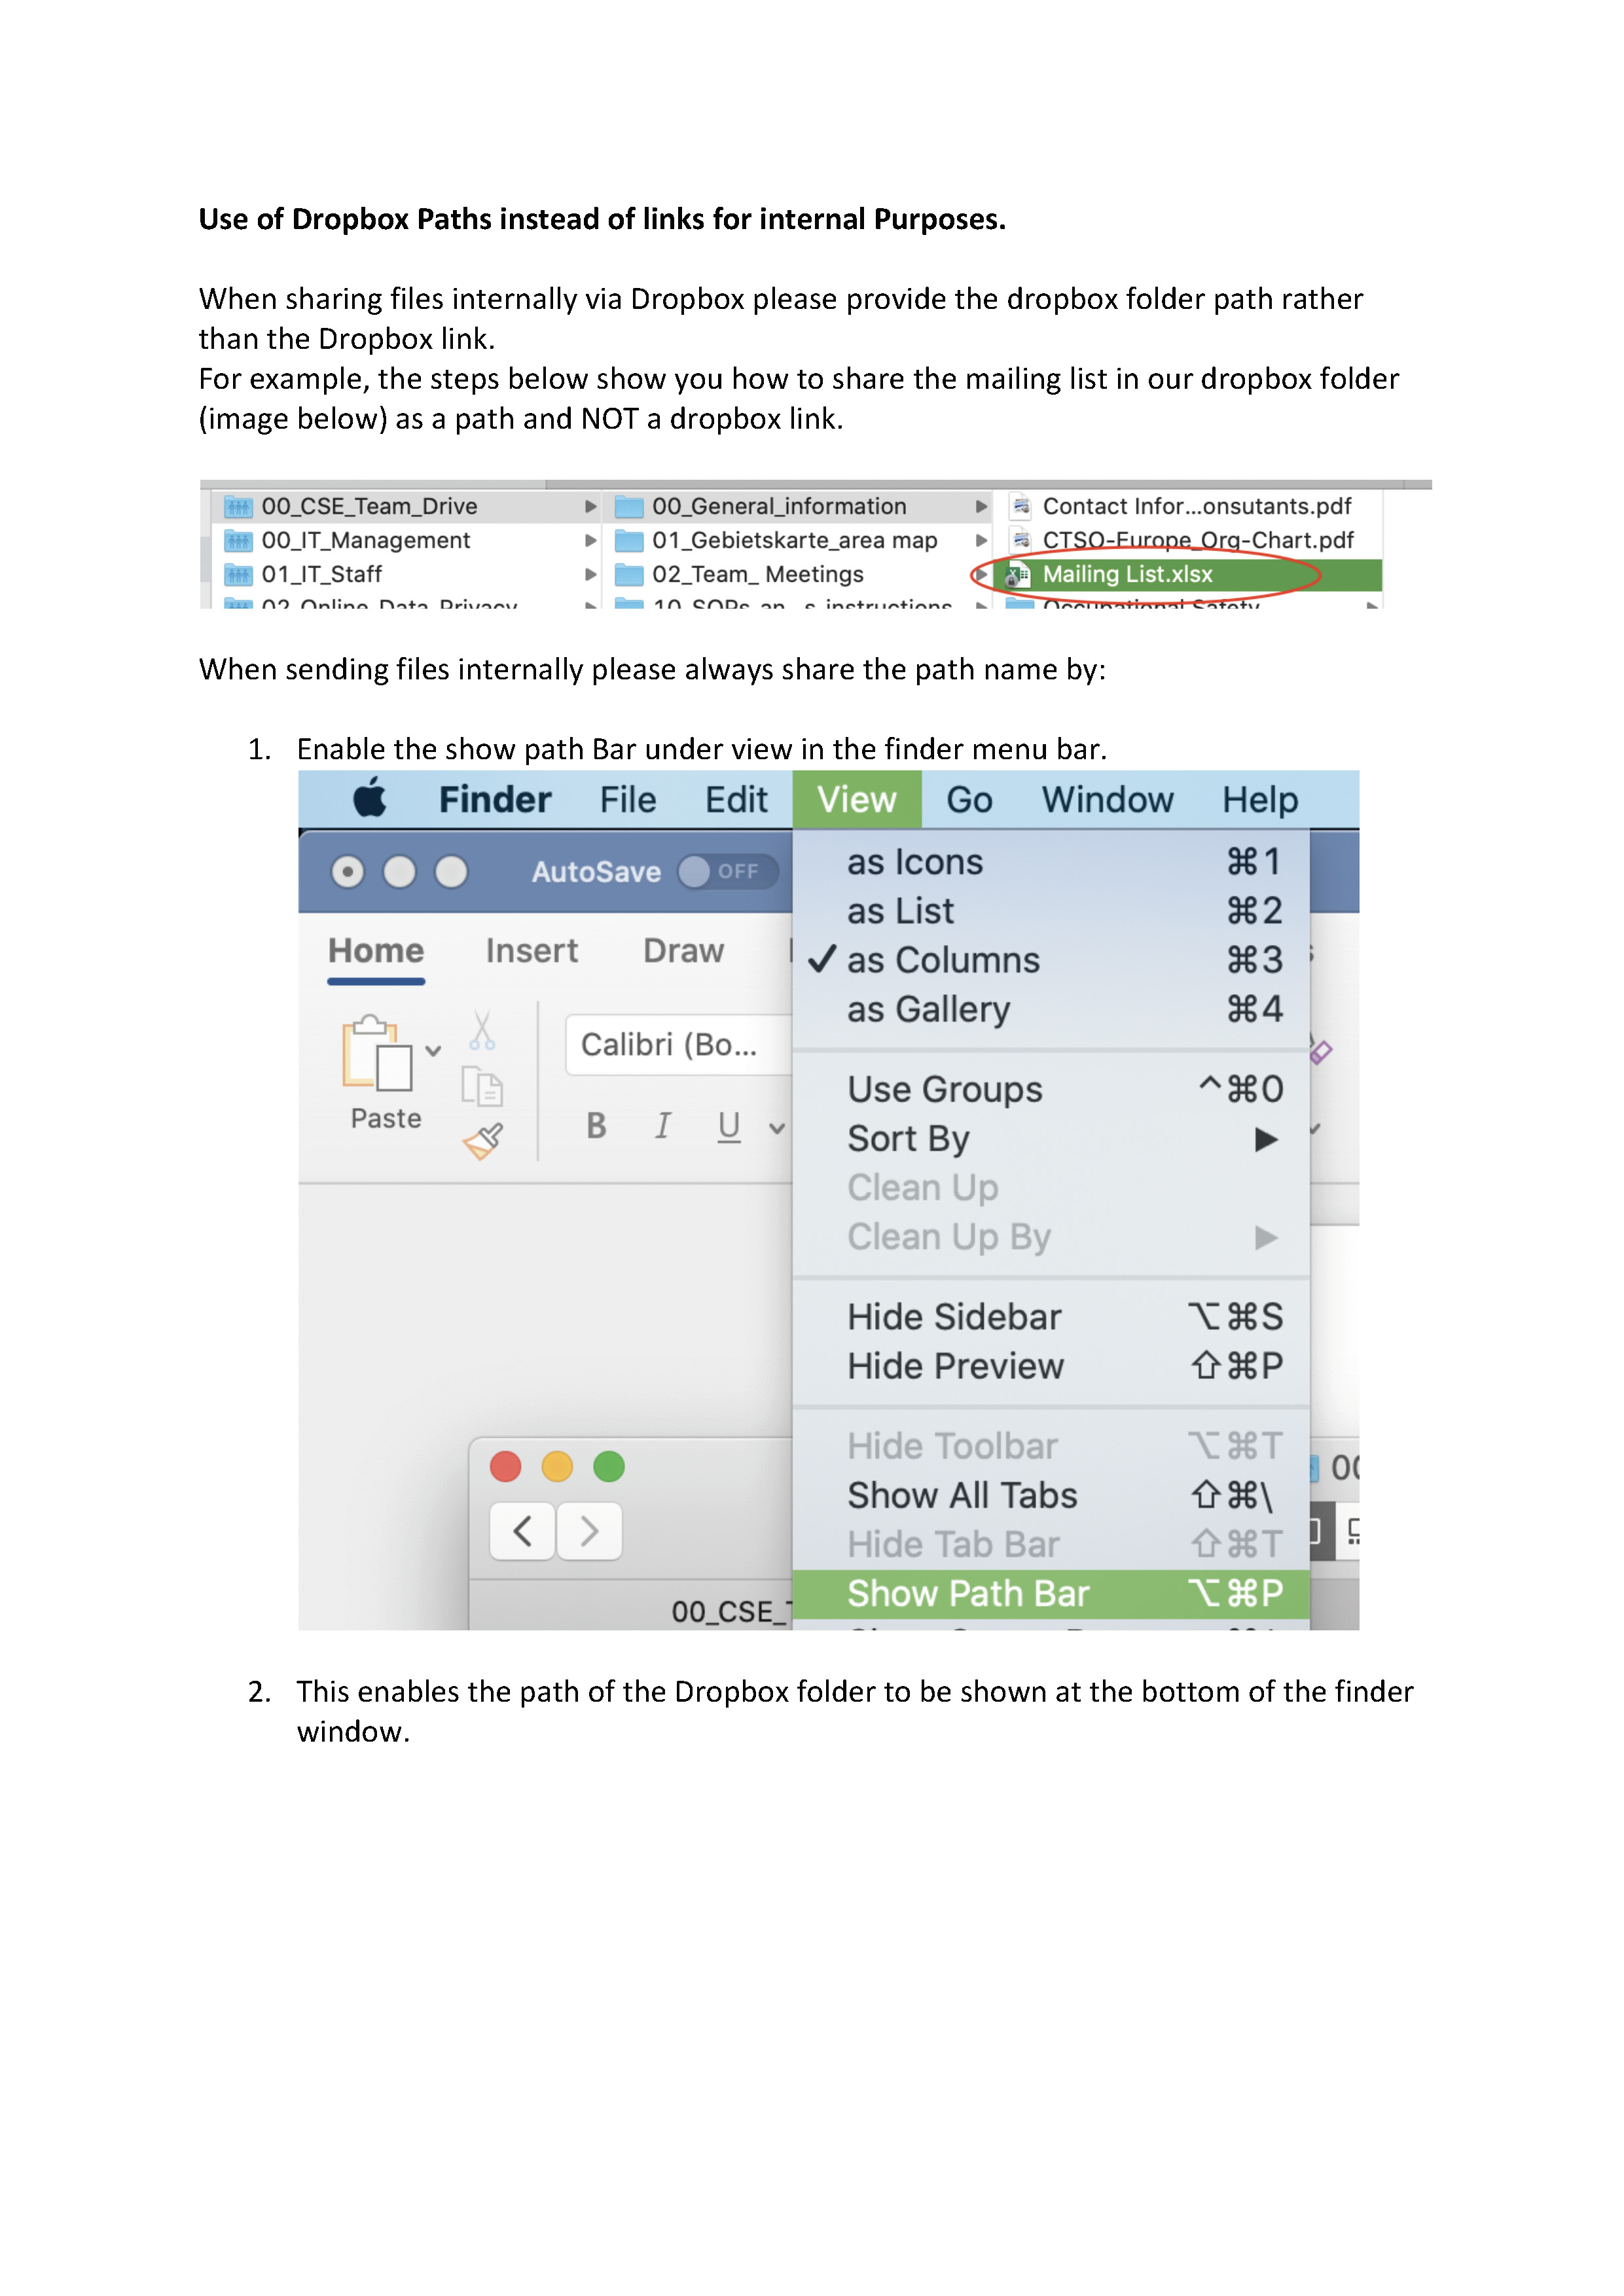 210706_Use_of_Dropbox_Paths_Seite_1